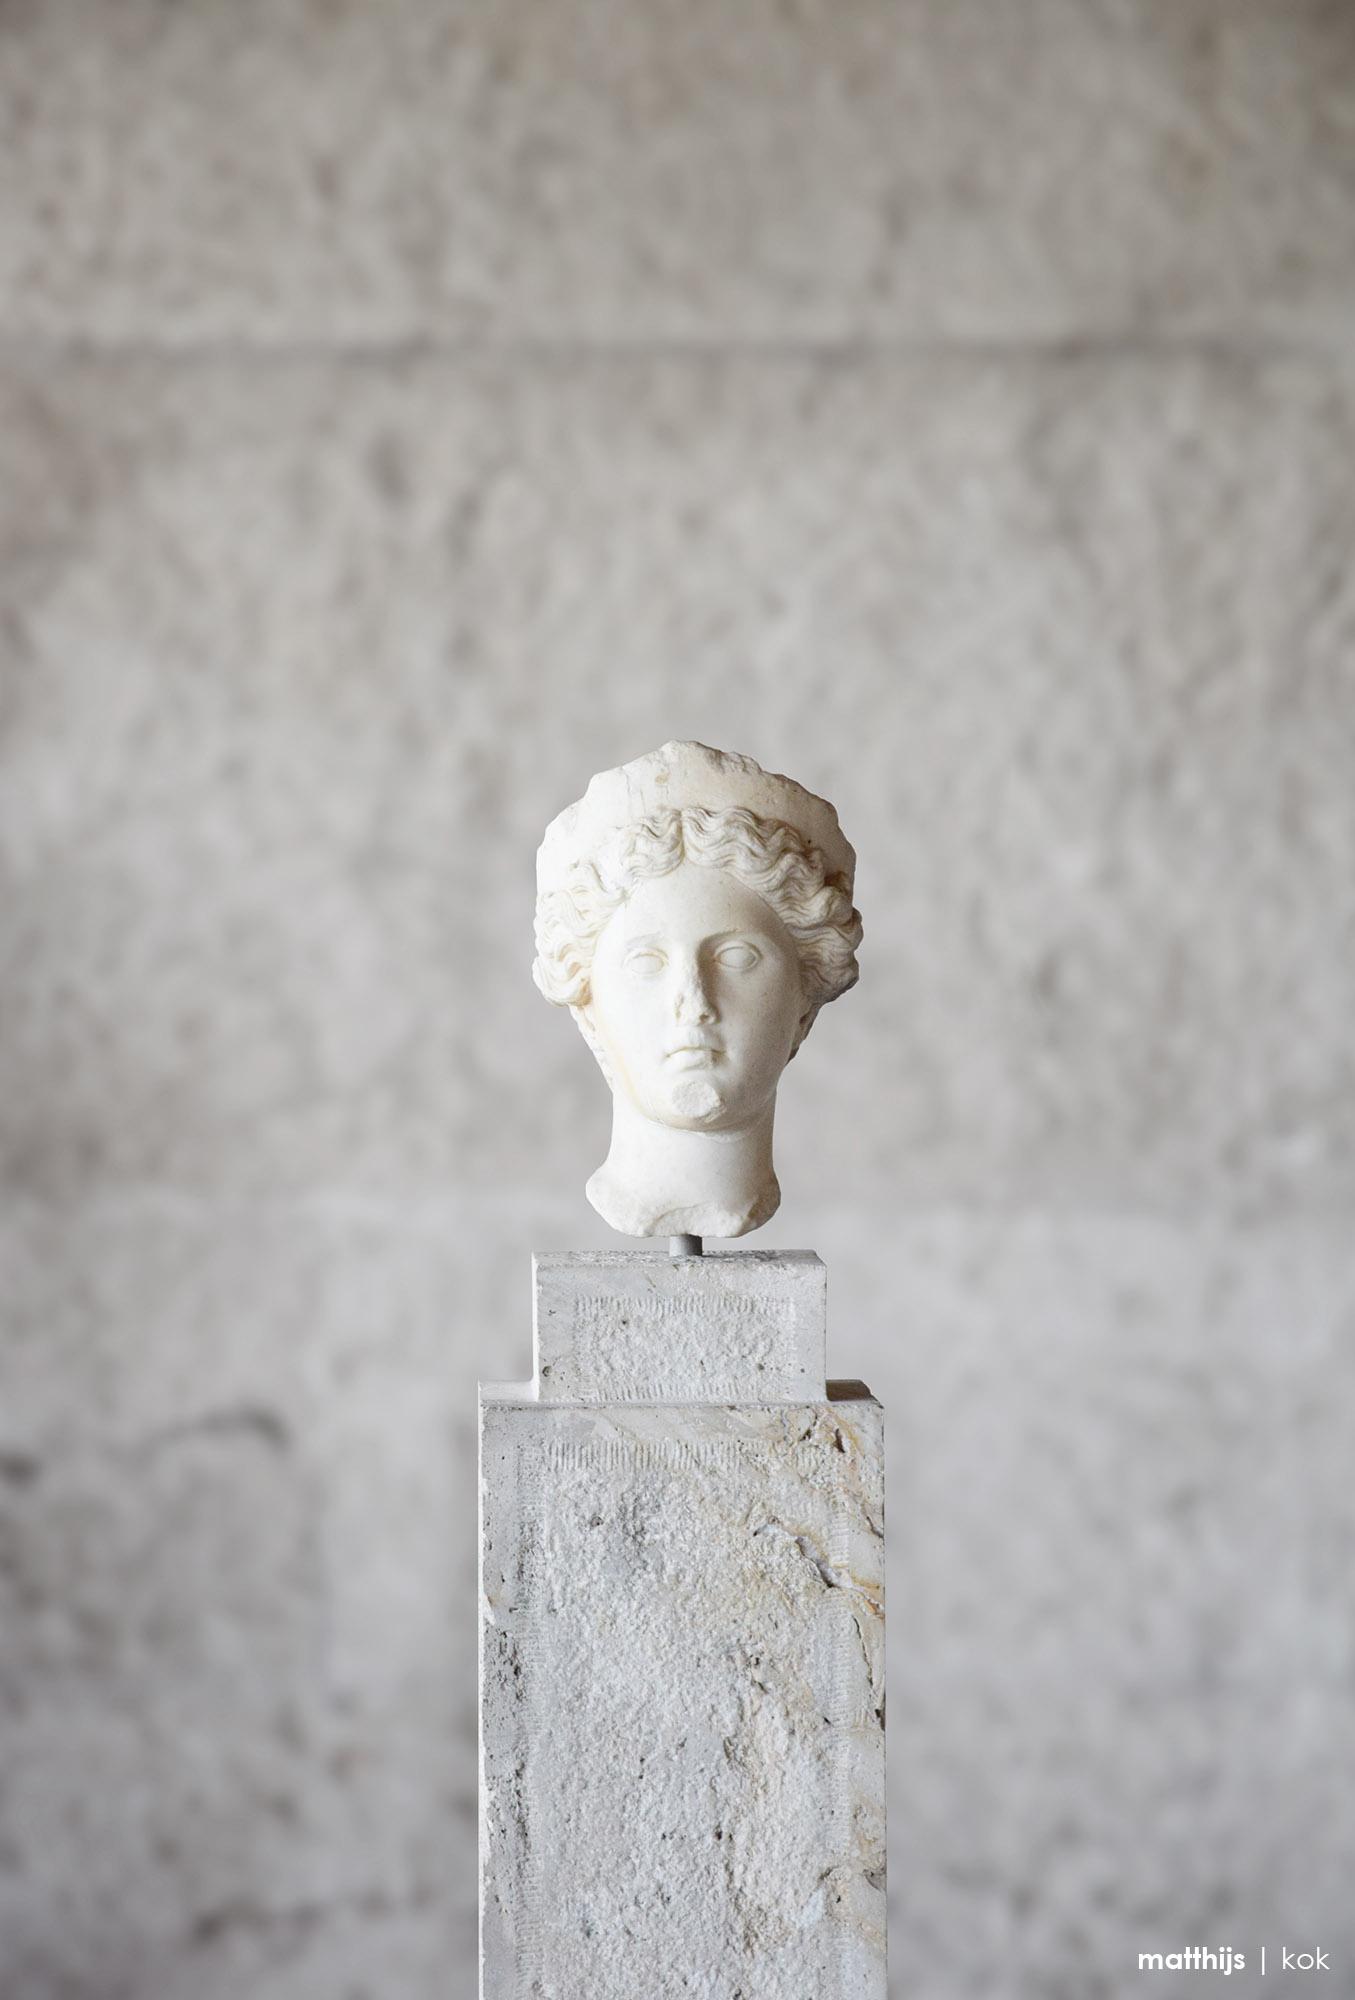 Stoa of Attalos, Athens, Greece | Photo by Matthijs Kok